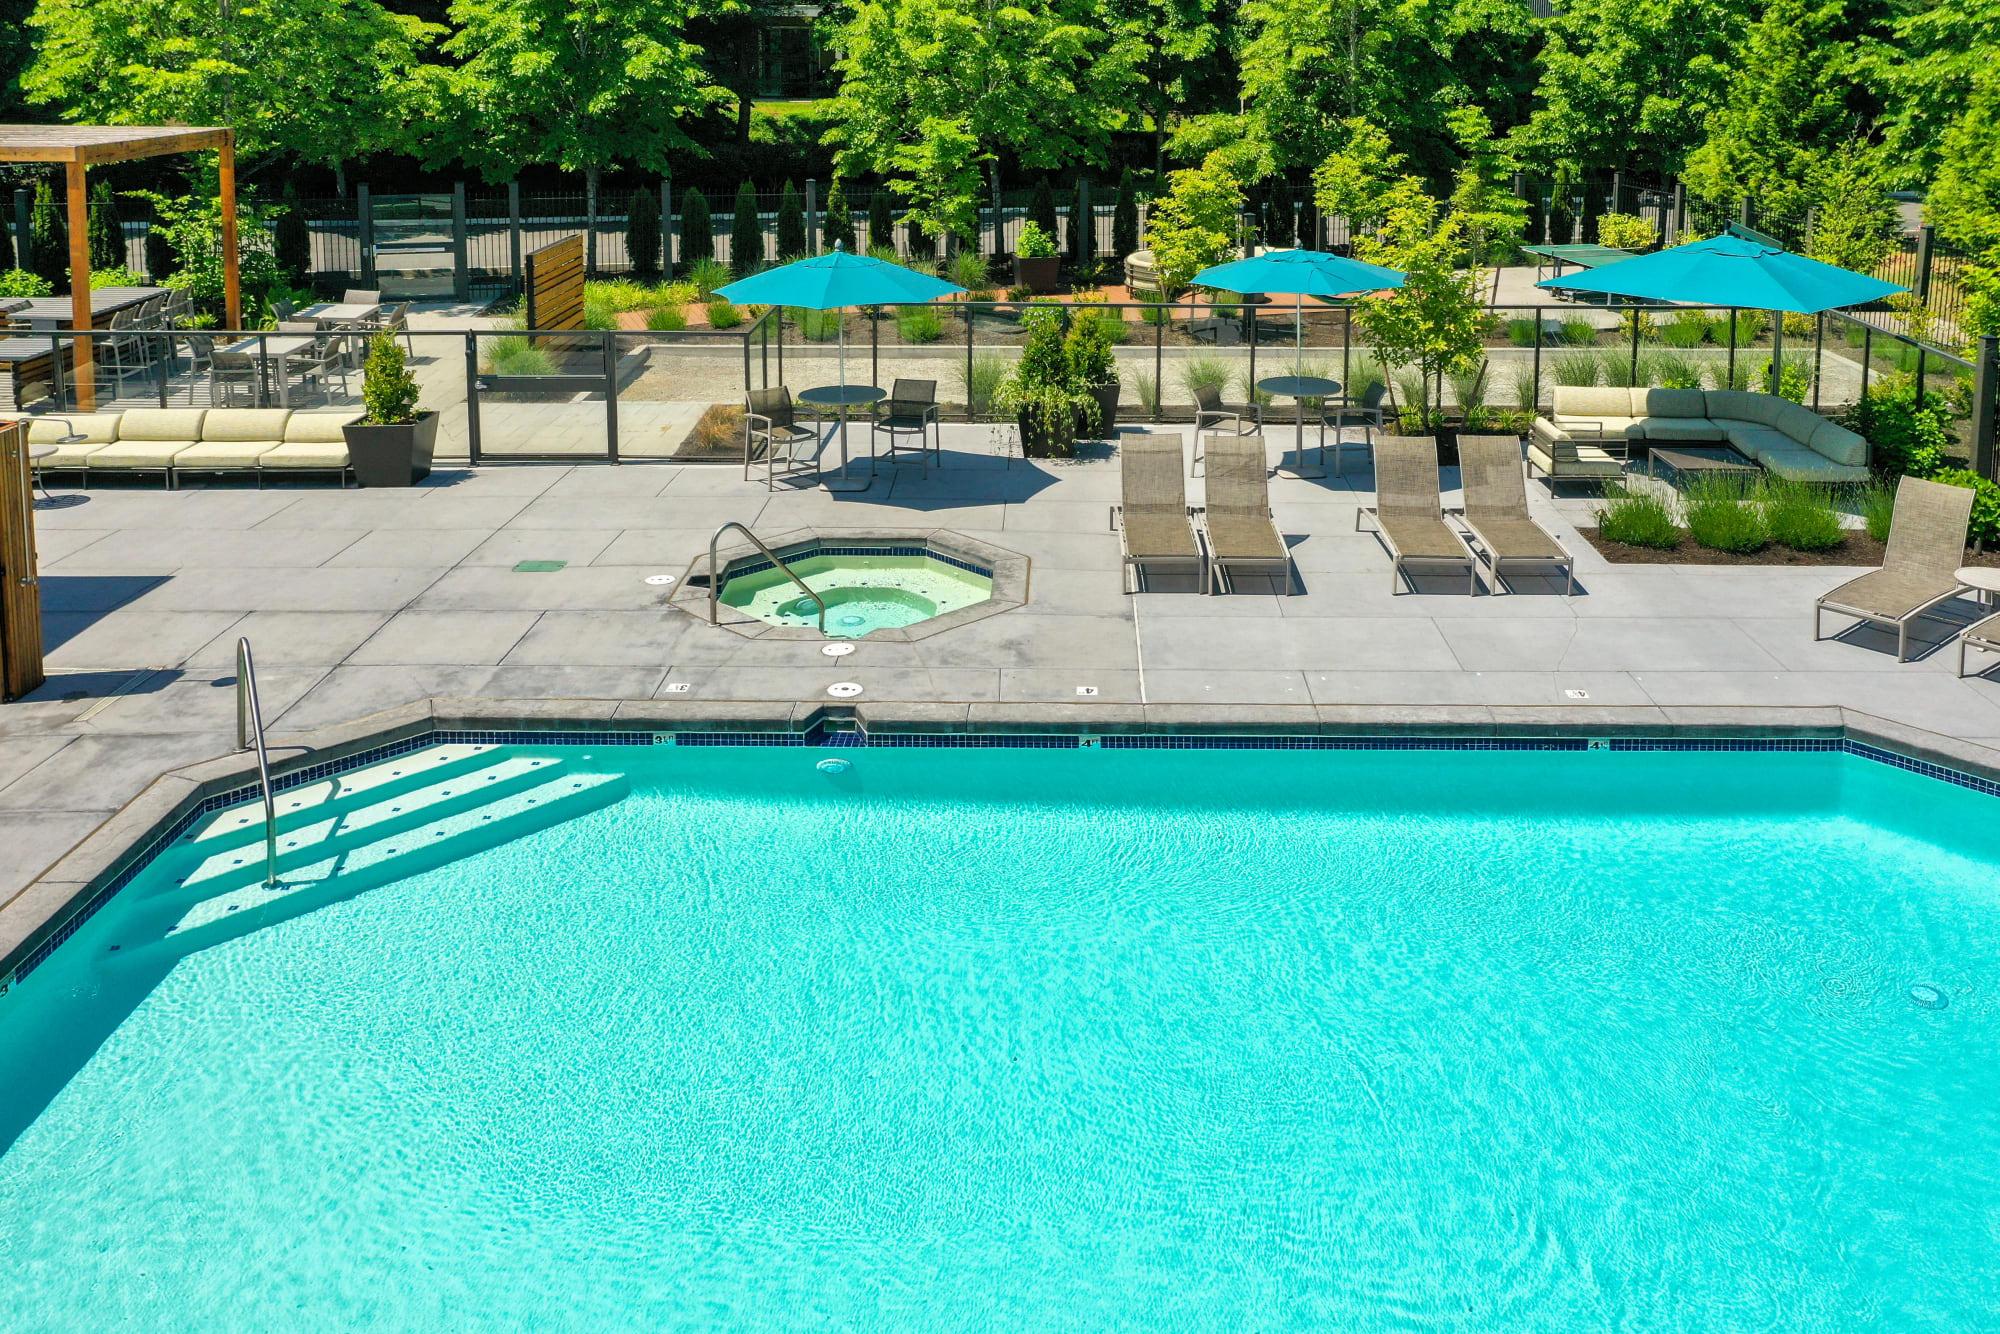 The pool at Brookside Village in Auburn, Washington